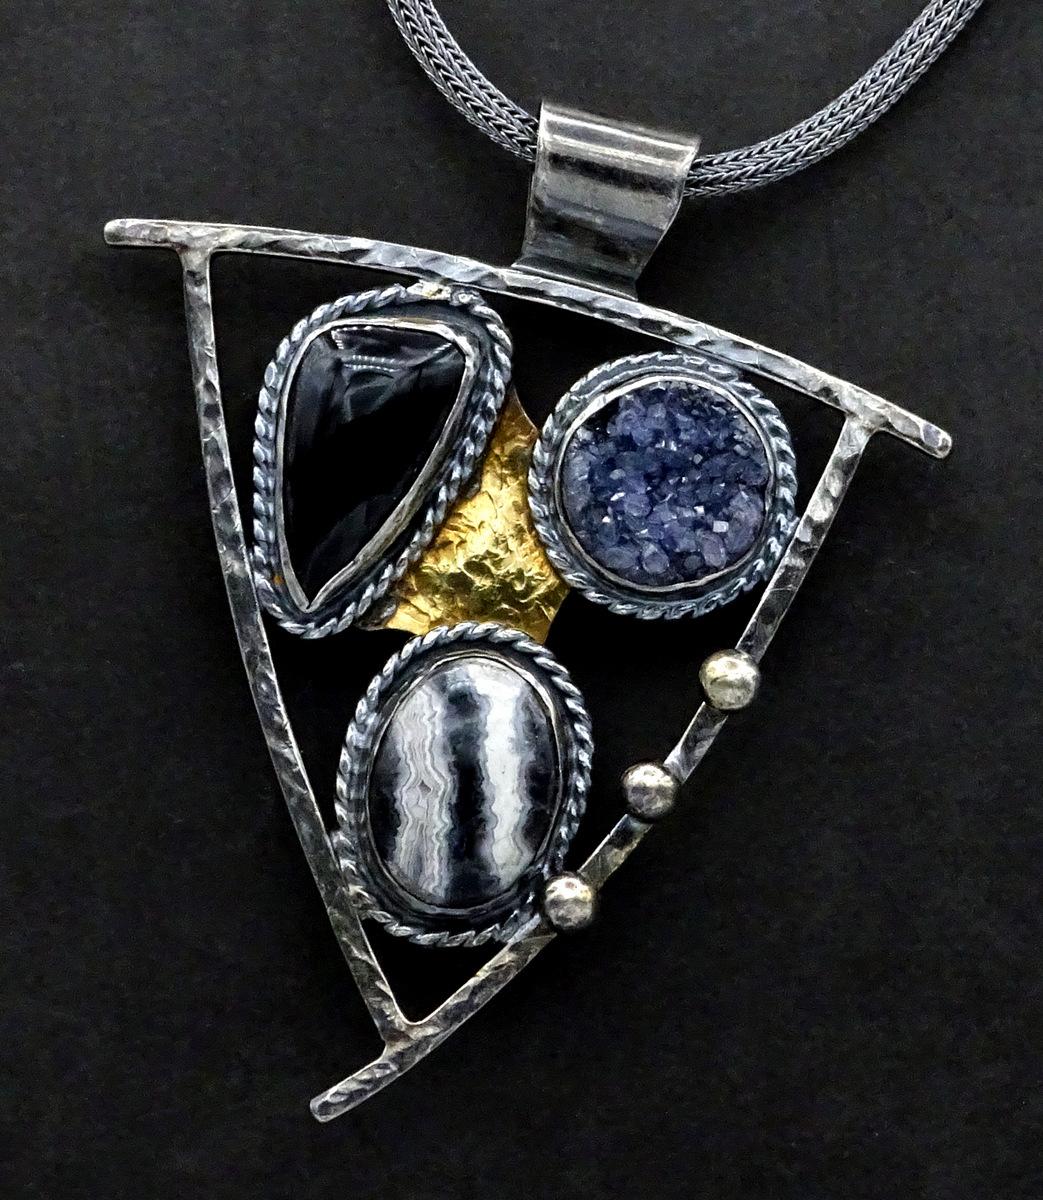 2-Handcrafted Silver& Stone Geometric Pendant, Sylvia McCollum-1-003.JPG